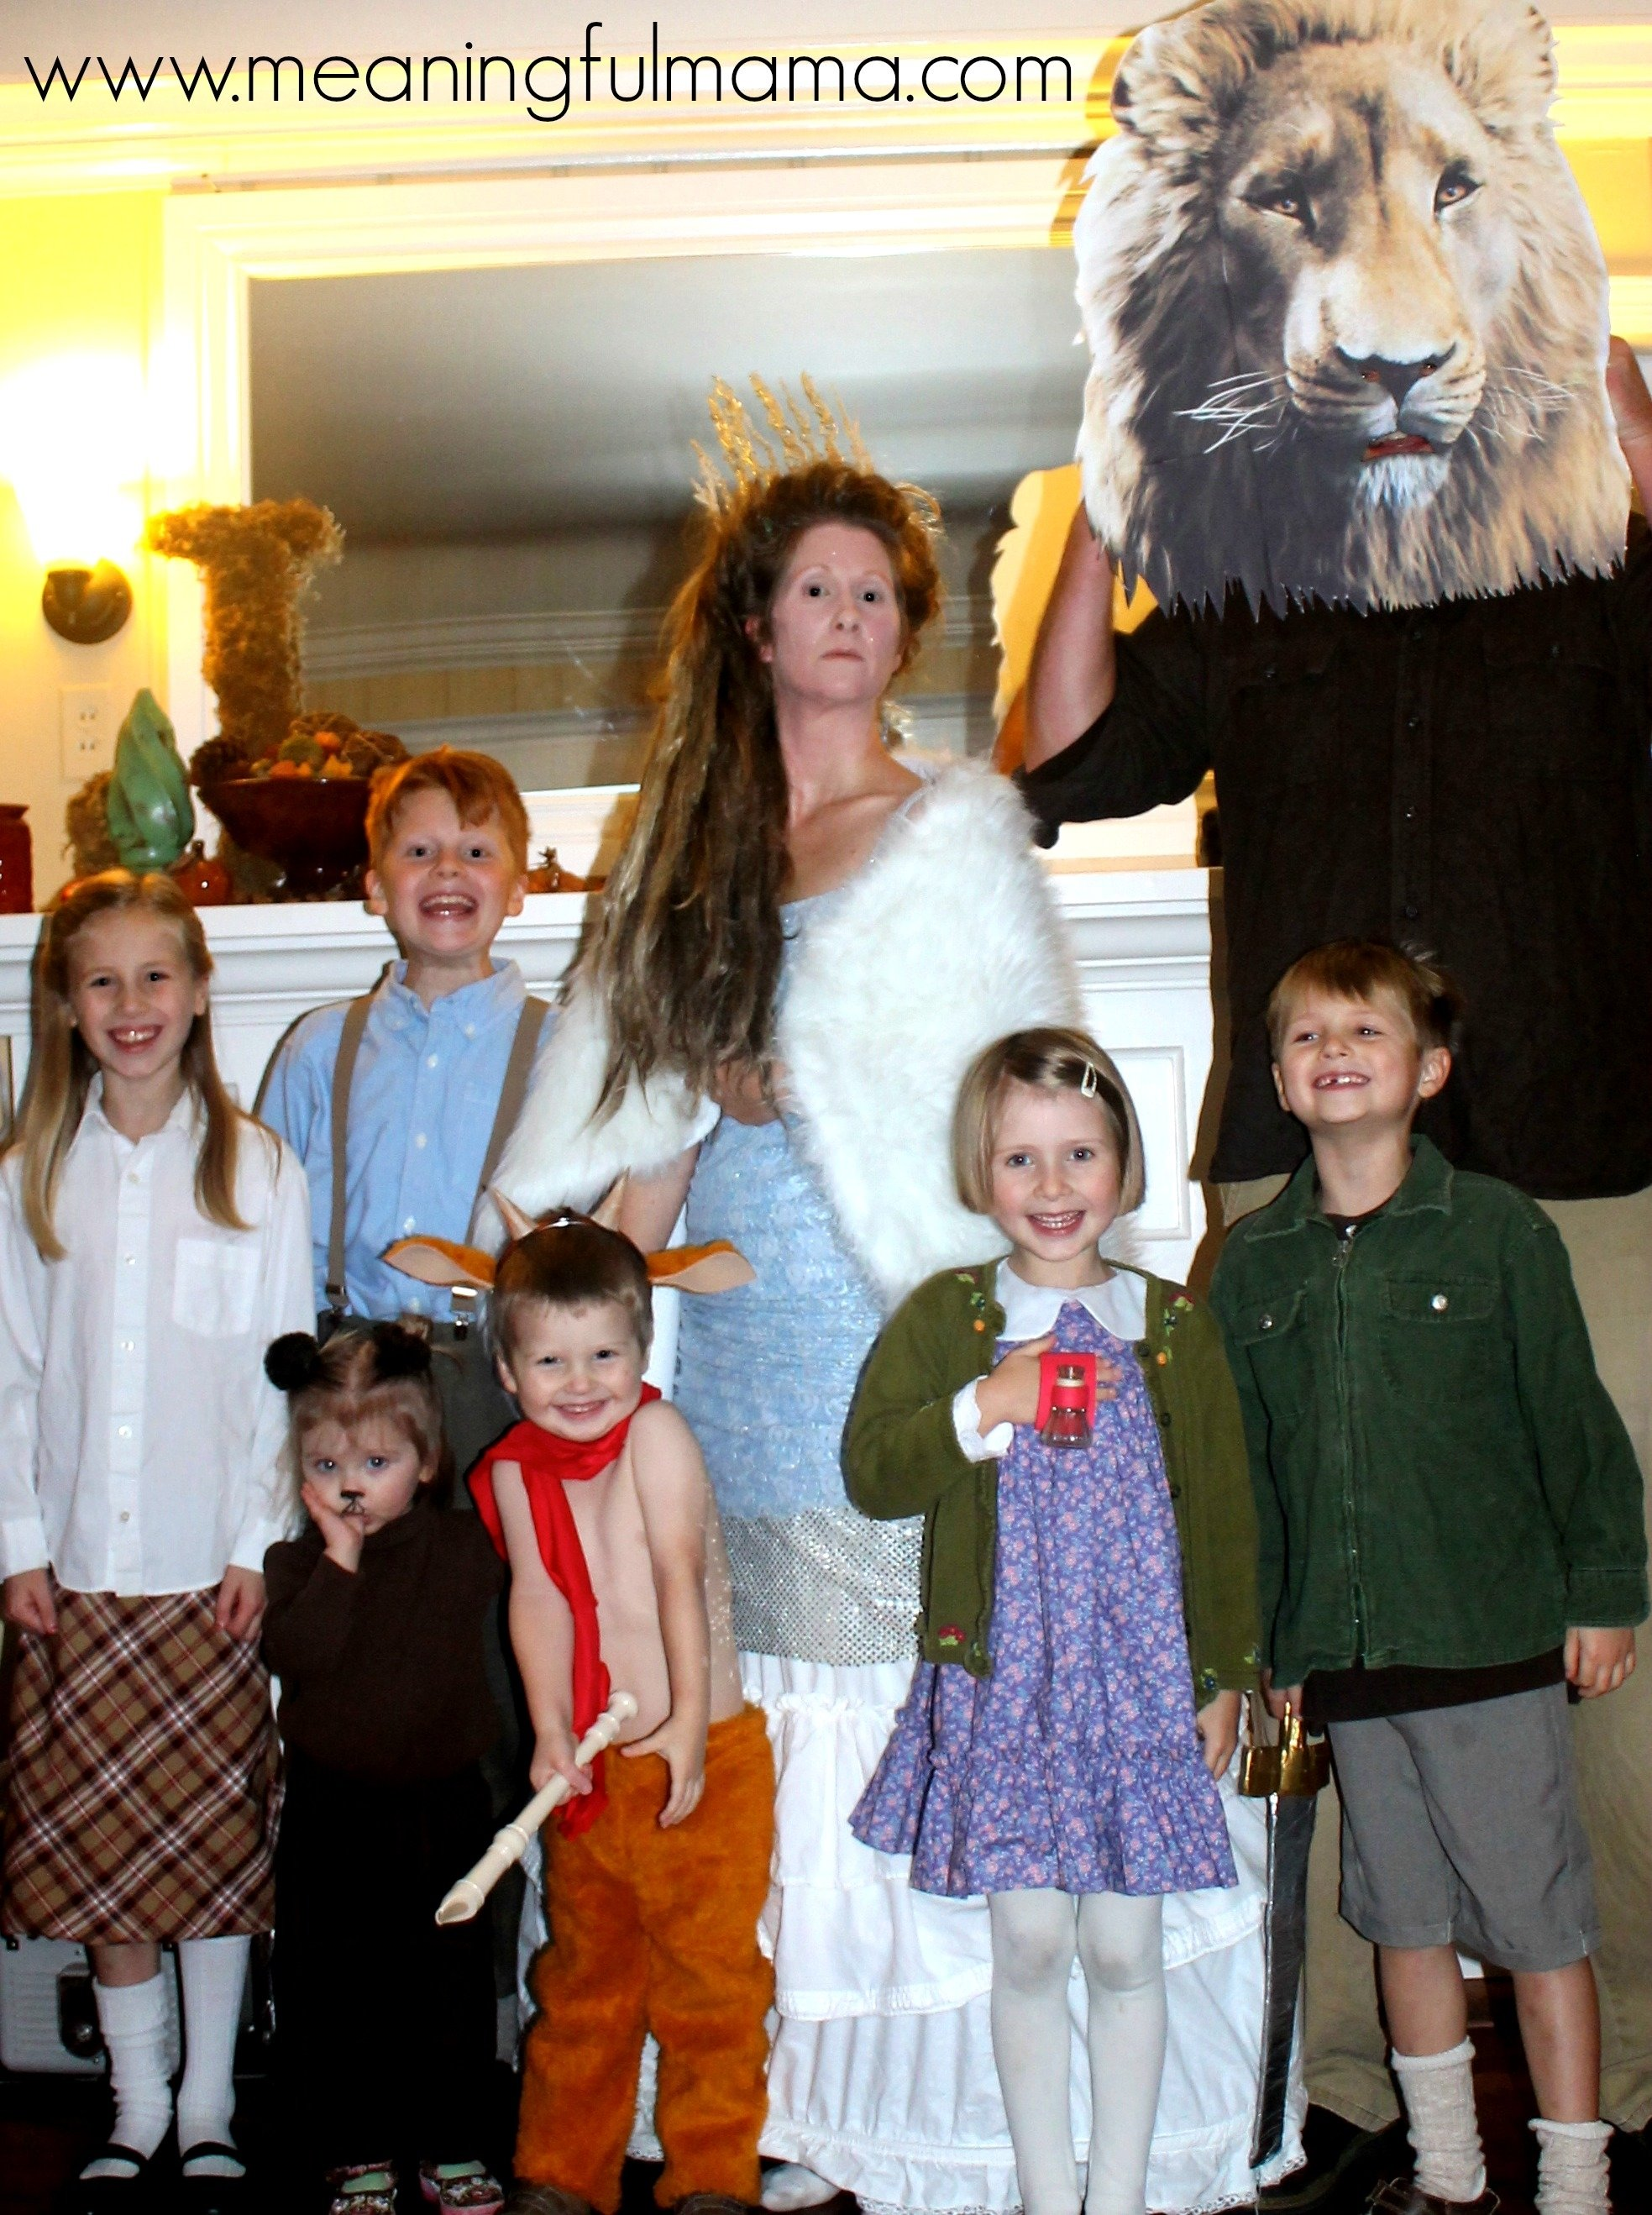 10 Spectacular Good Ideas For Halloween Costumes 2013 15 creative family costume ideas 2020